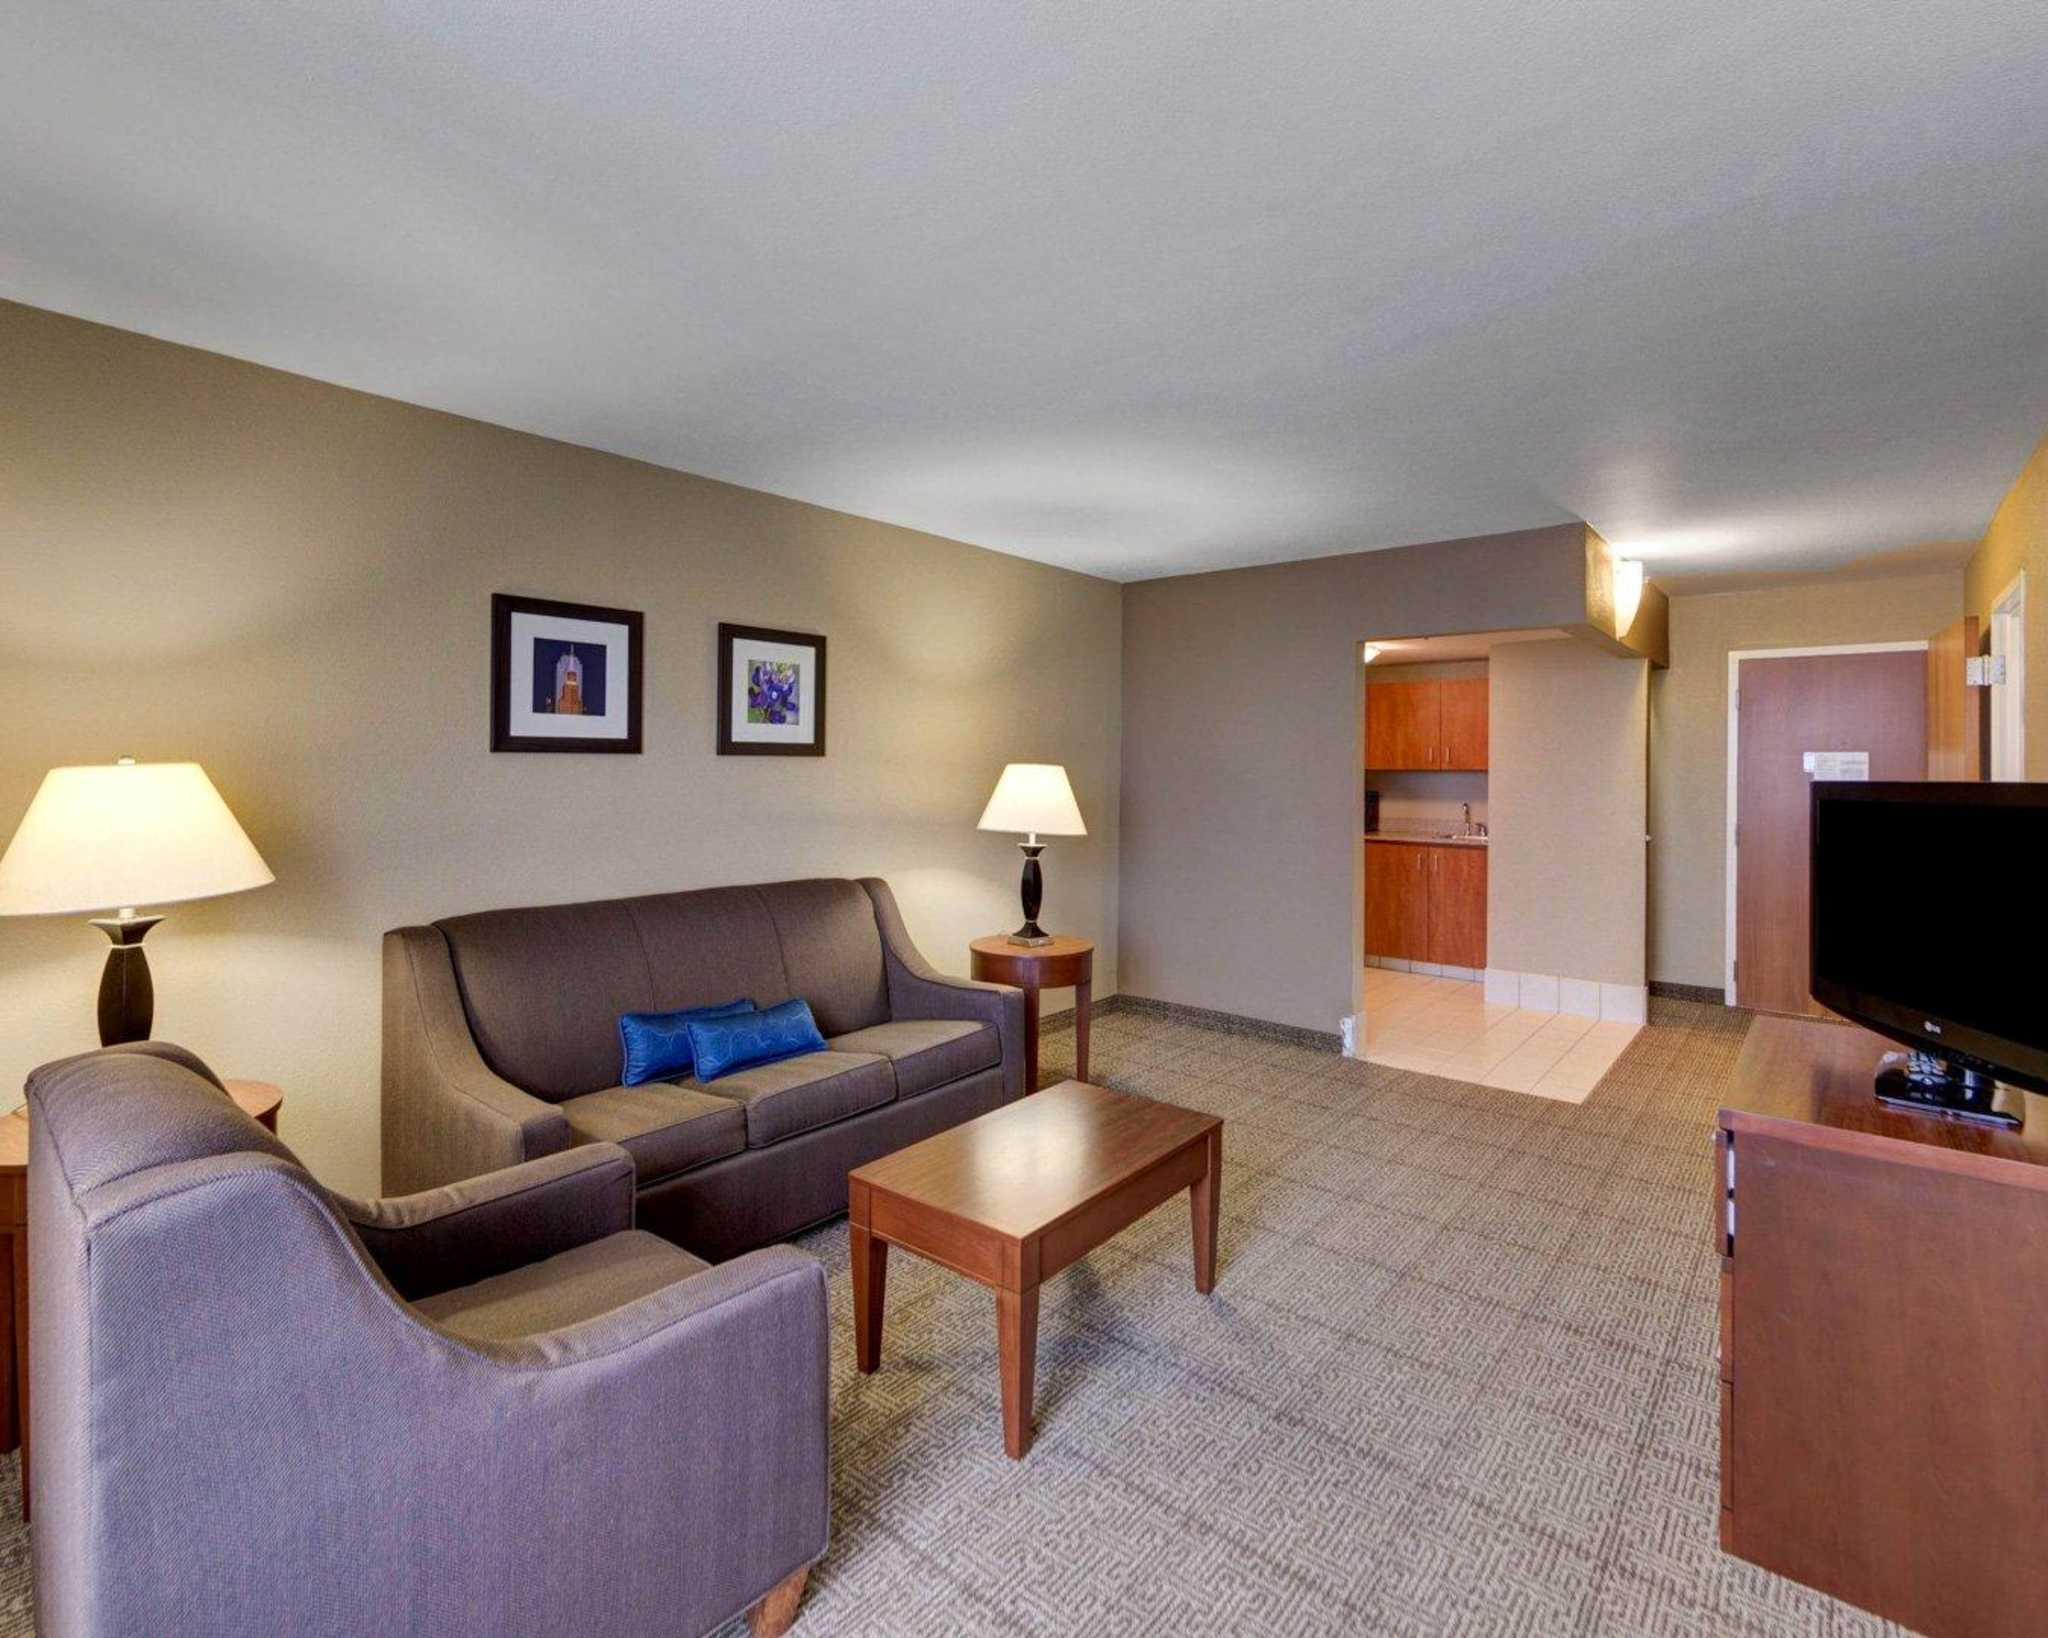 Comfort Inn & Suites Plano East image 54